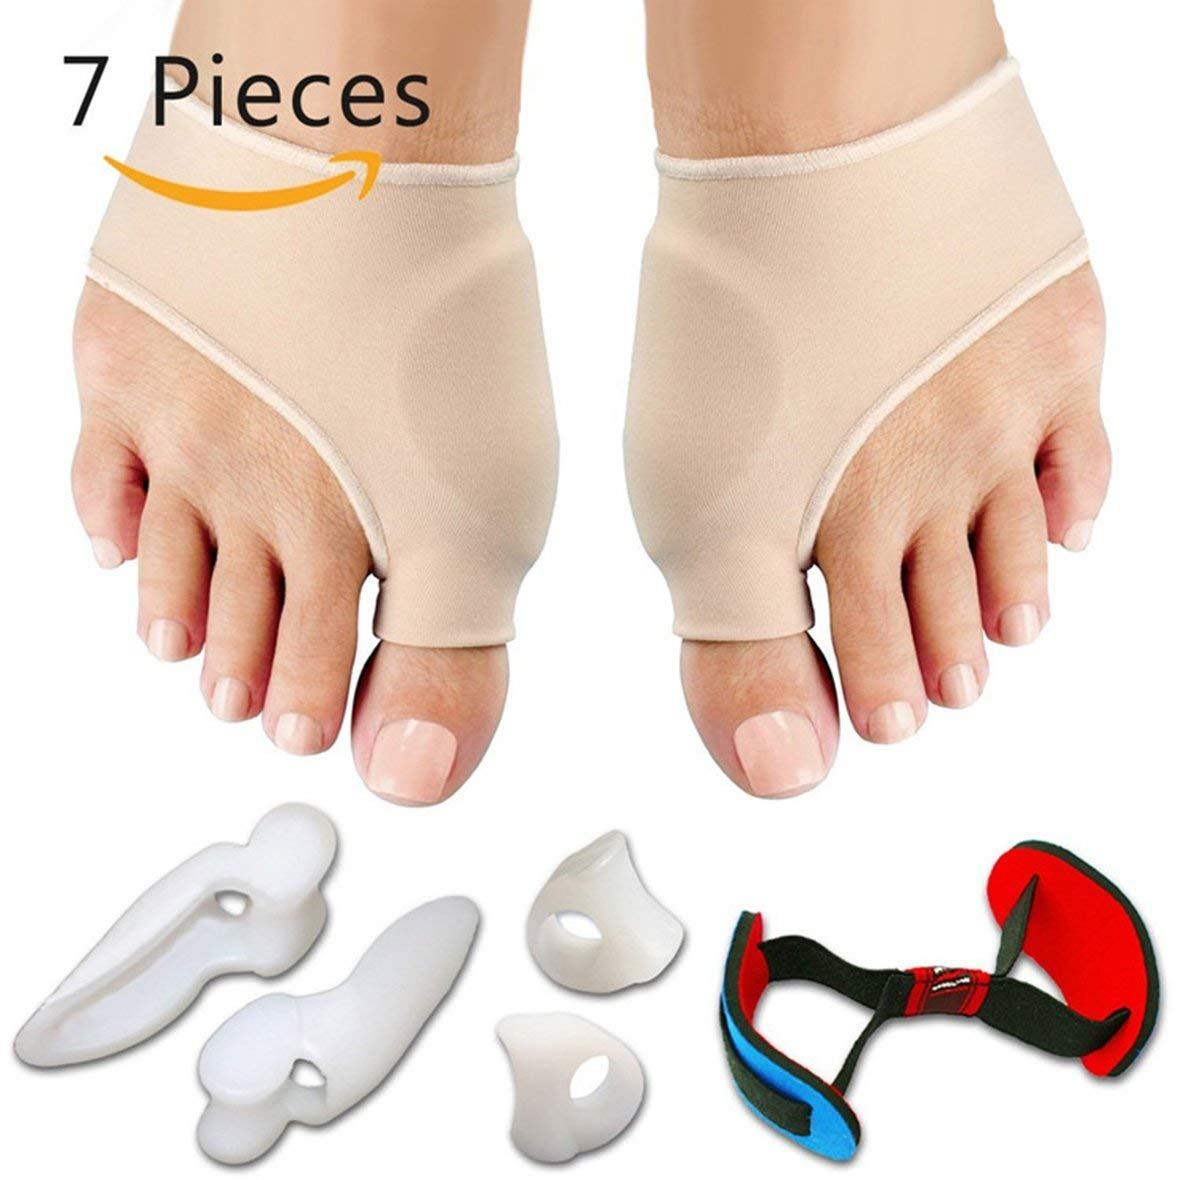 Tivolii Hallux Valgus Corrector Alignment Bunion Protector 7PCS/SET Bunion Sleeves Toe Separator Metatarsal Splint Orthotics Pain Relief Foot Care Tool